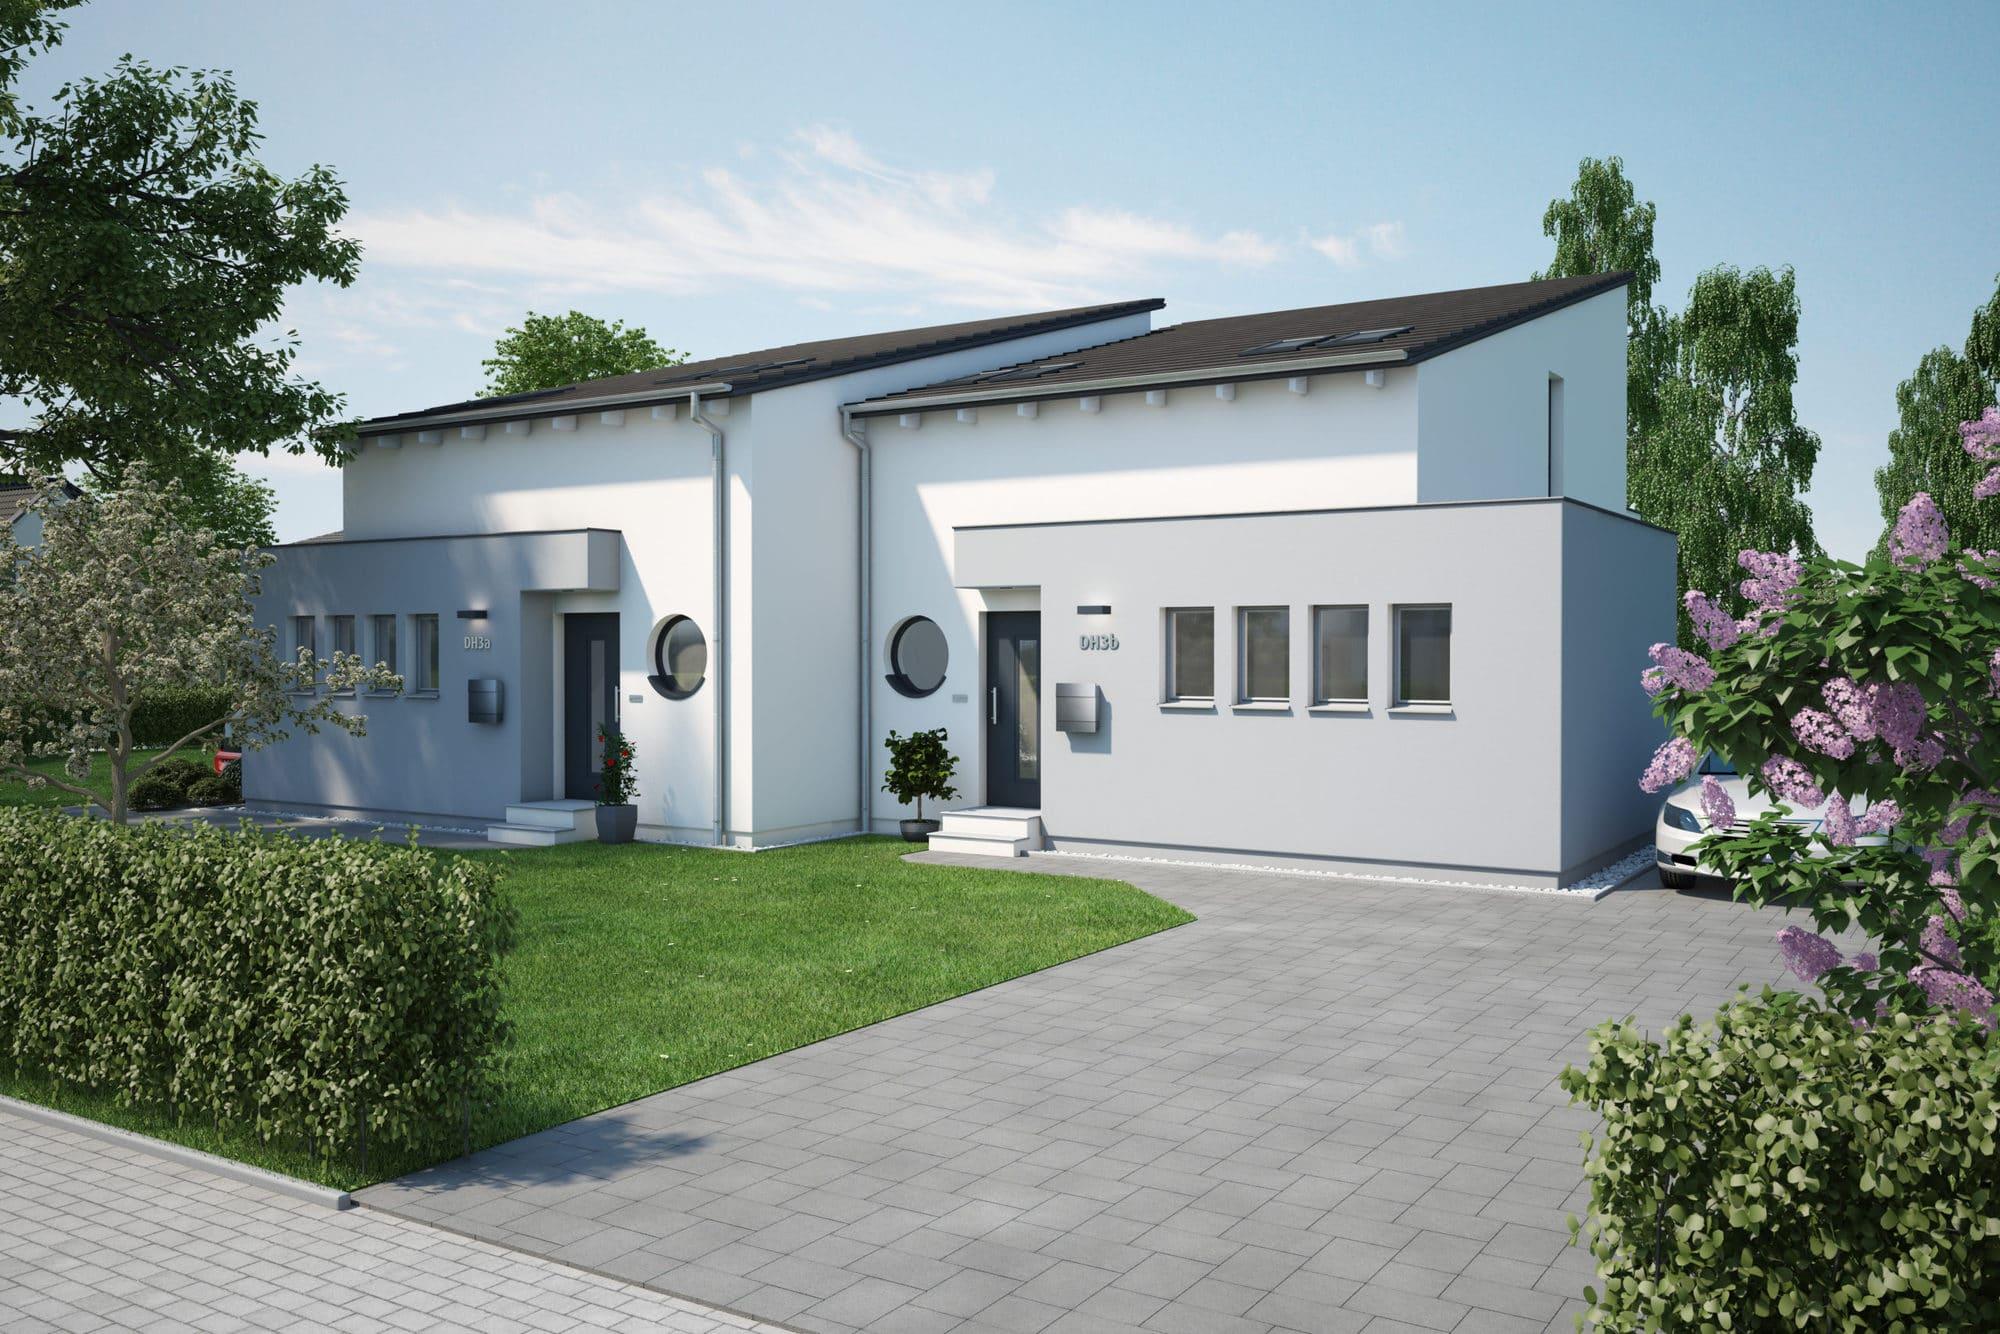 doppelhaus-pultdach-2